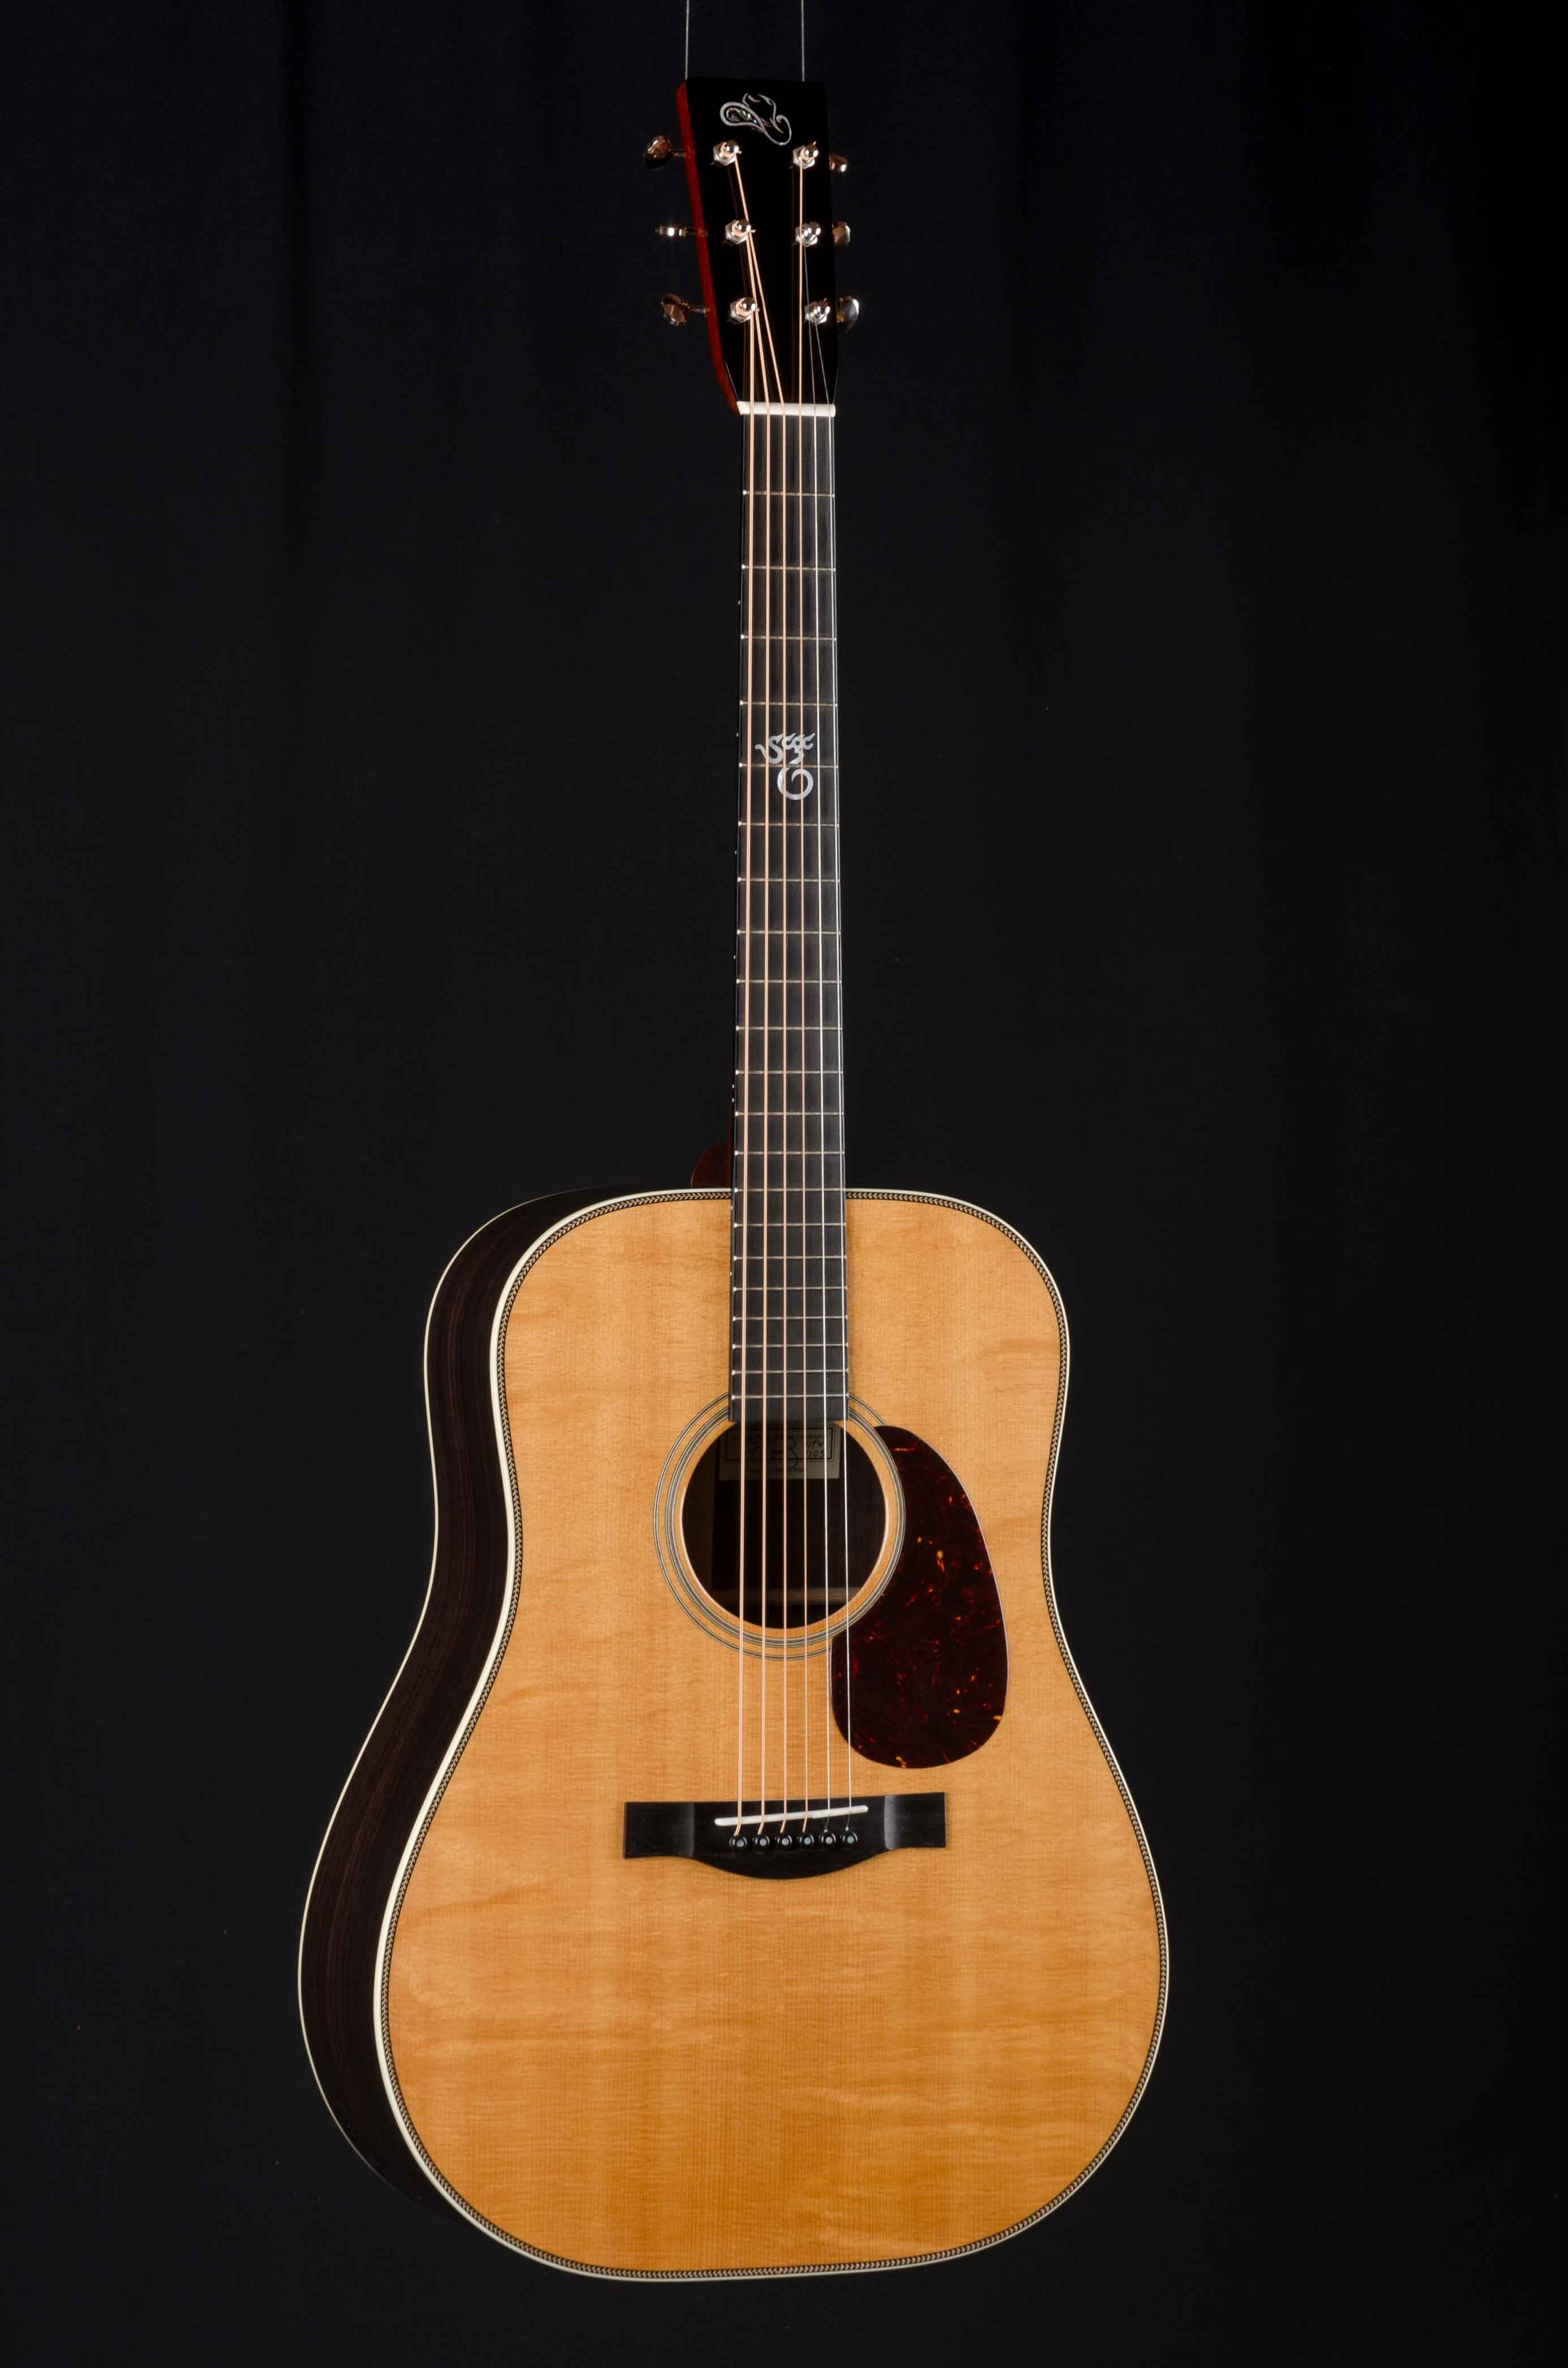 santa cruz b pw brad paisley signature model down home guitars. Black Bedroom Furniture Sets. Home Design Ideas